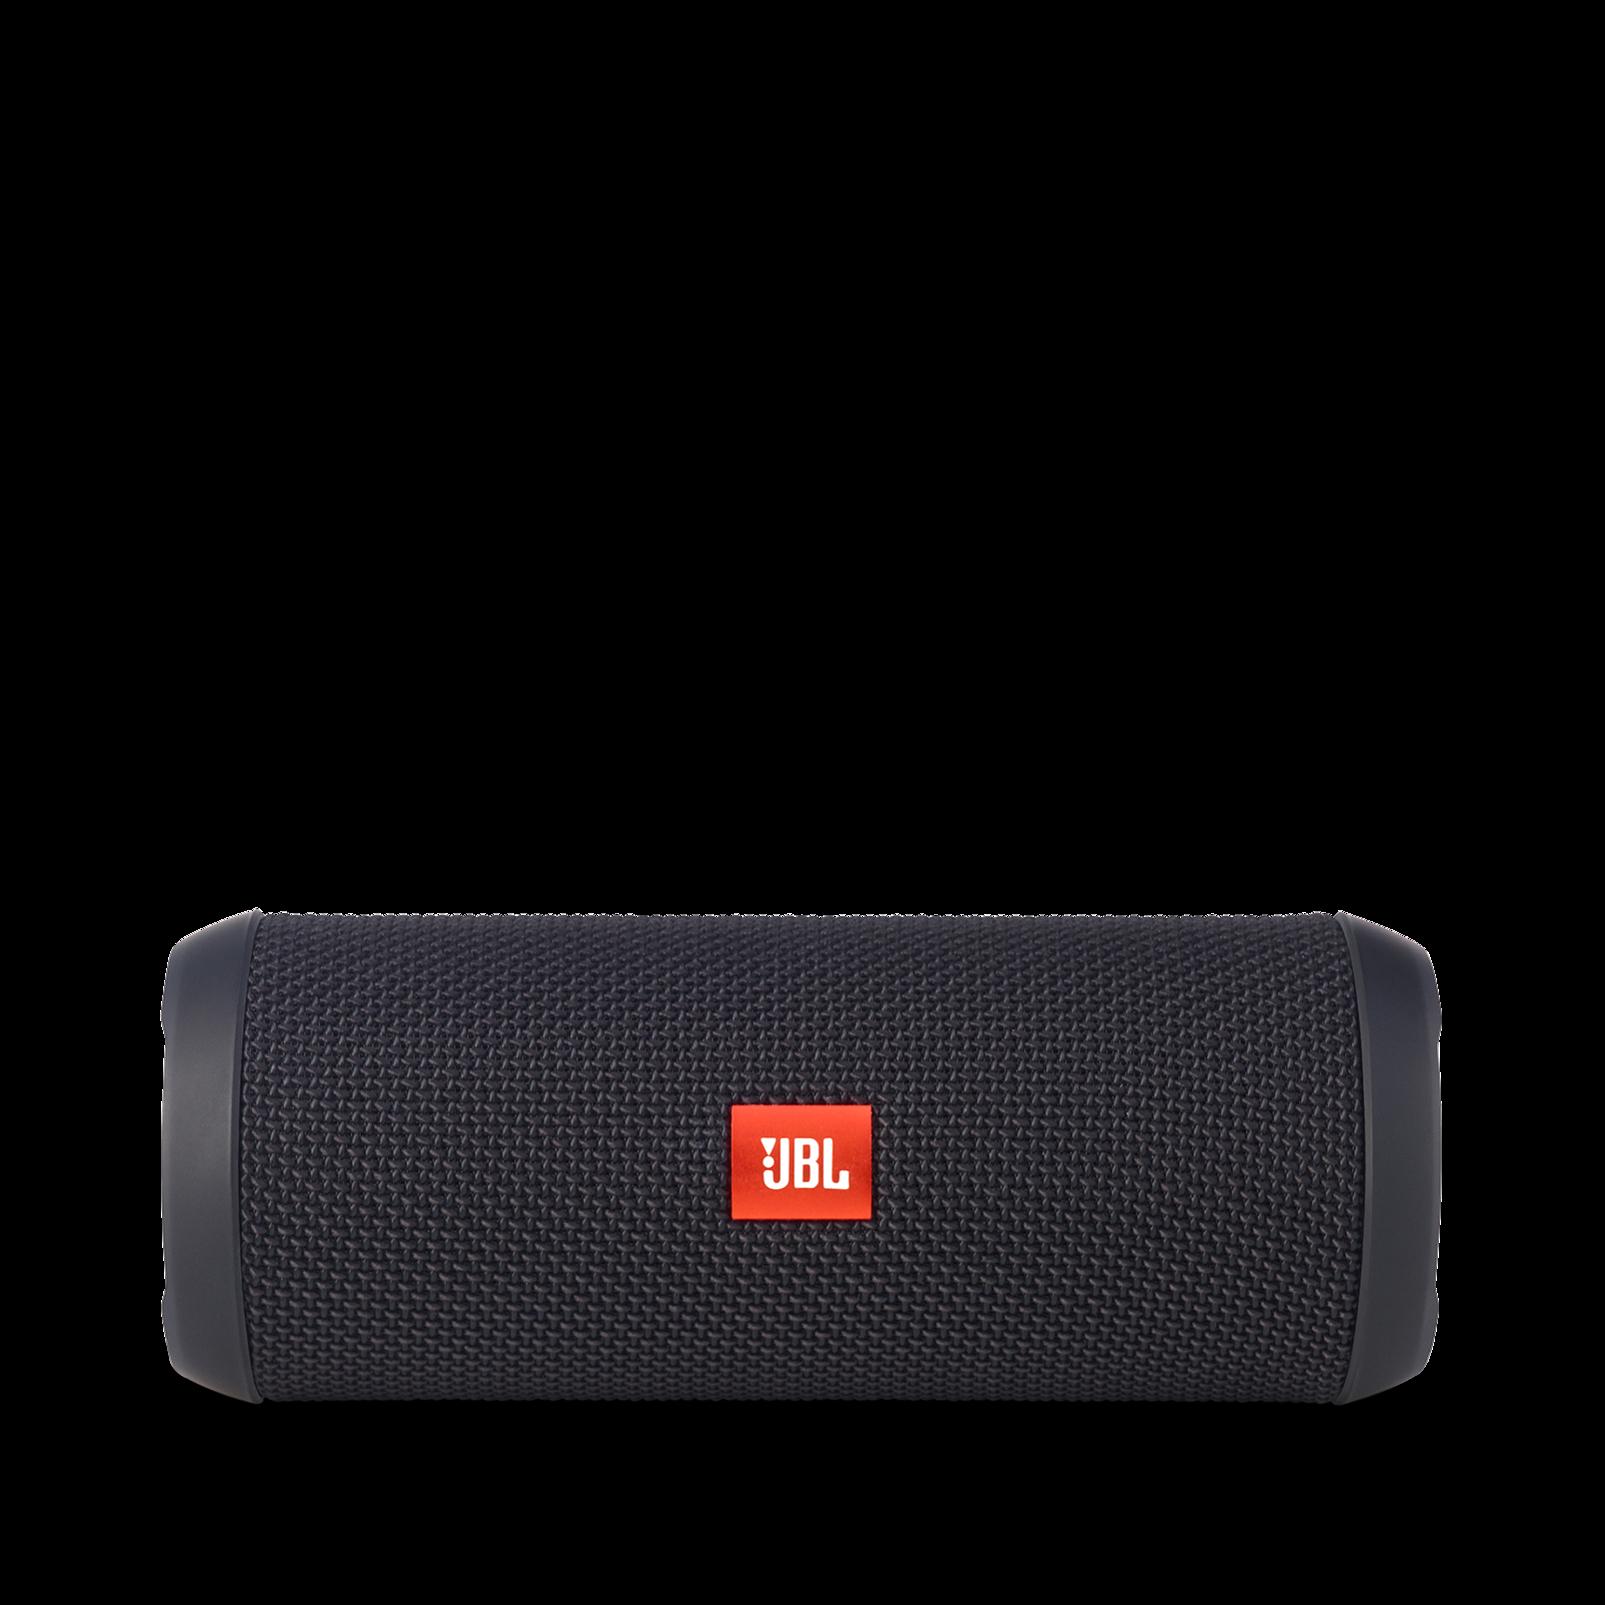 JBL Flip 3 - Black - Splashproof portable Bluetooth speaker with powerful sound and speakerphone technology - Front